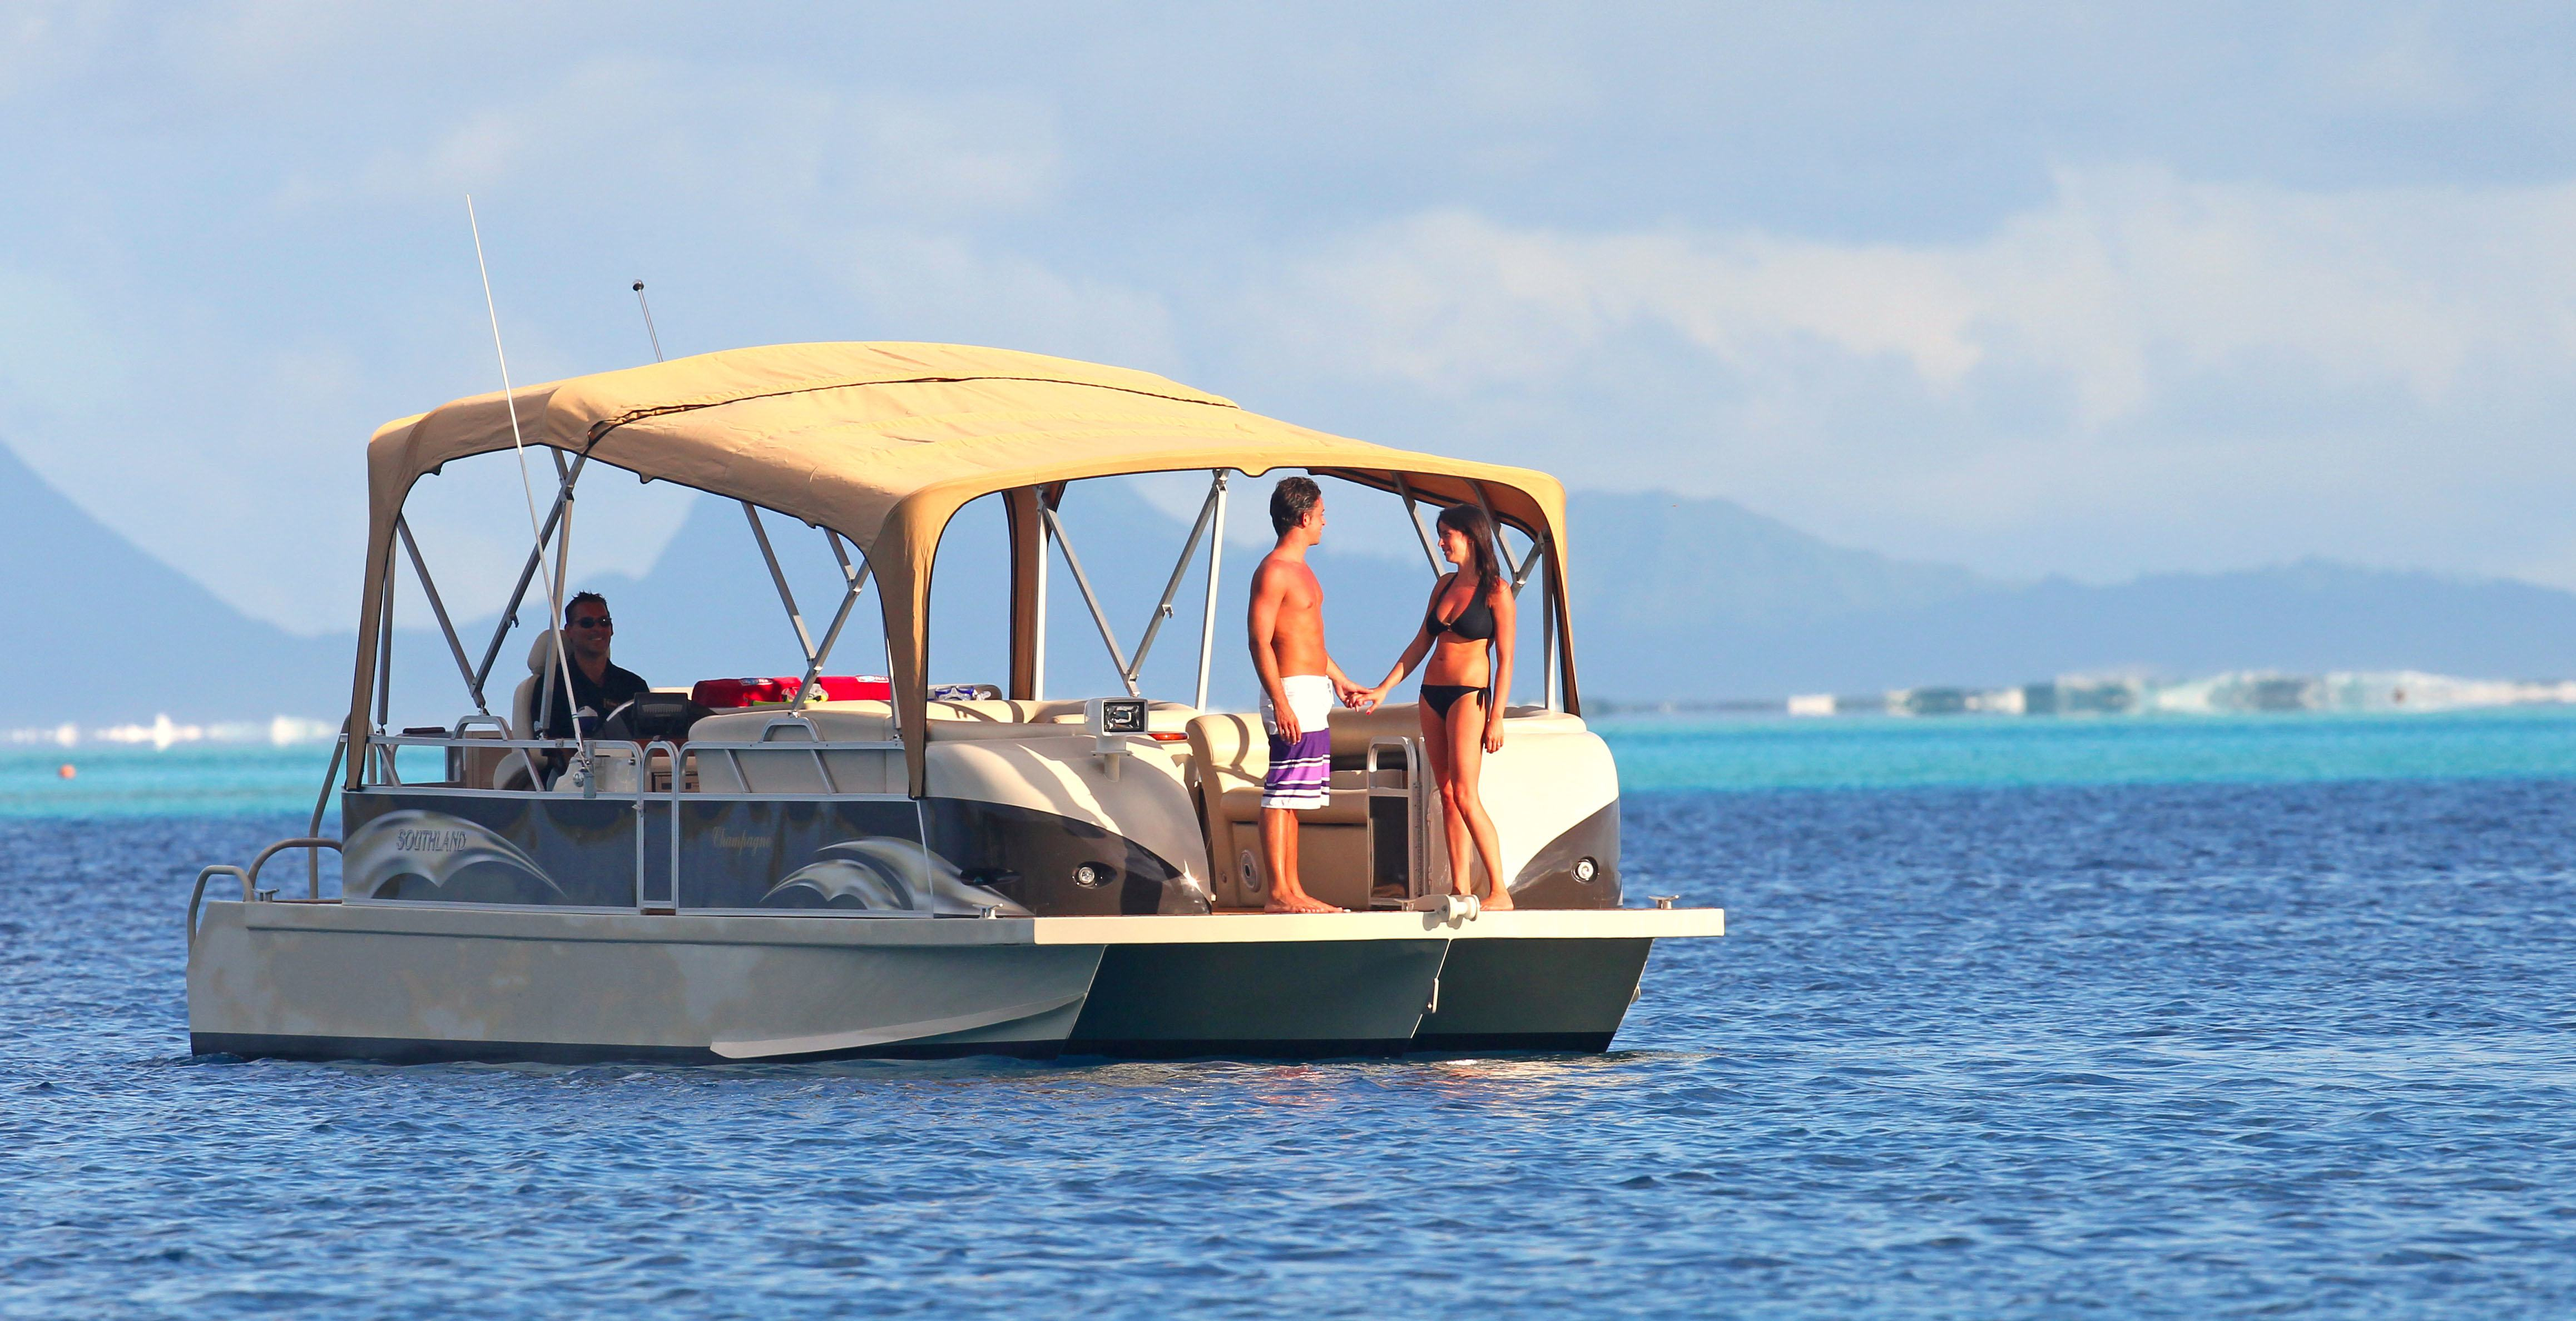 https://tahititourisme.com.br/wp-content/uploads/2017/08/Champagne-Boat-2.jpg